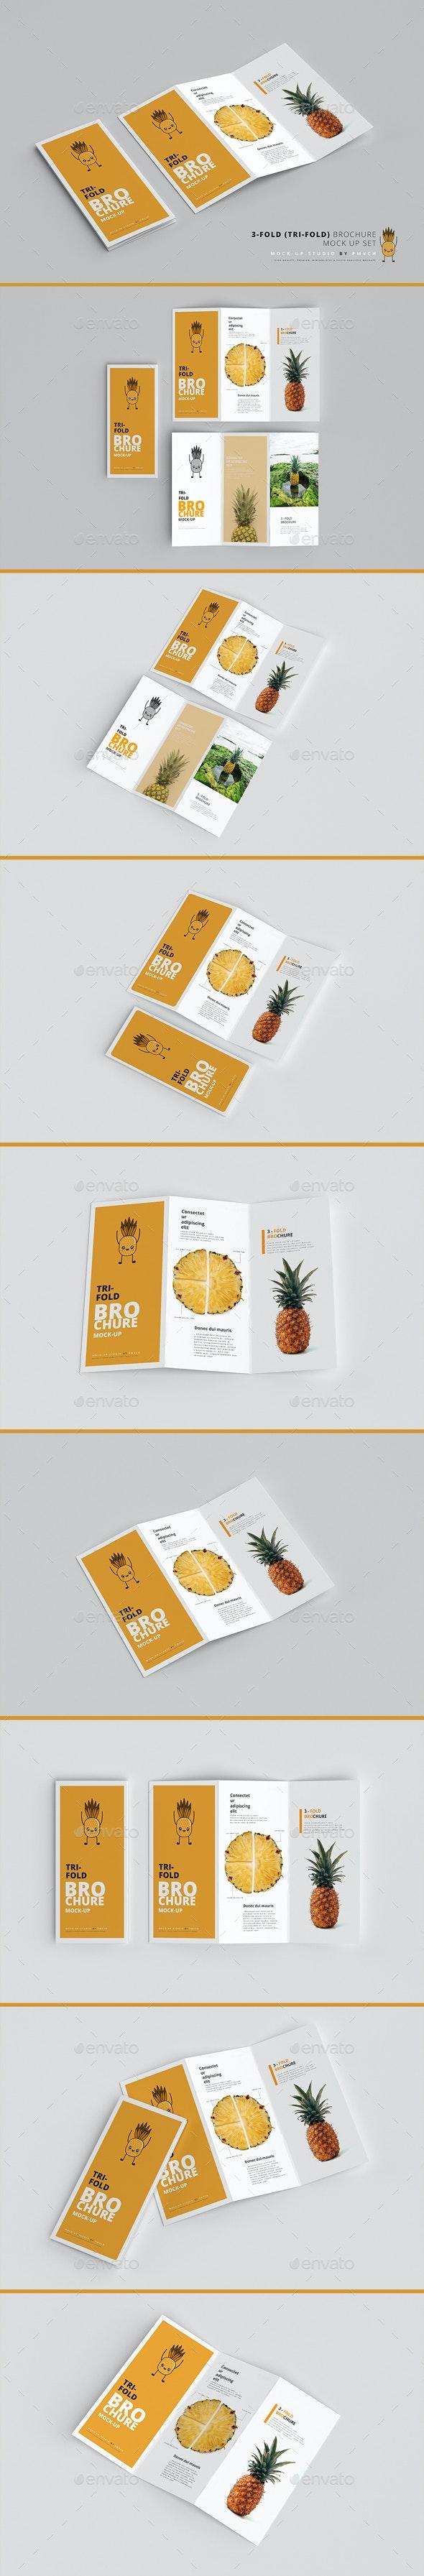 3-Fold (Tri-Fold) Brochure Mockups - Brochures Print